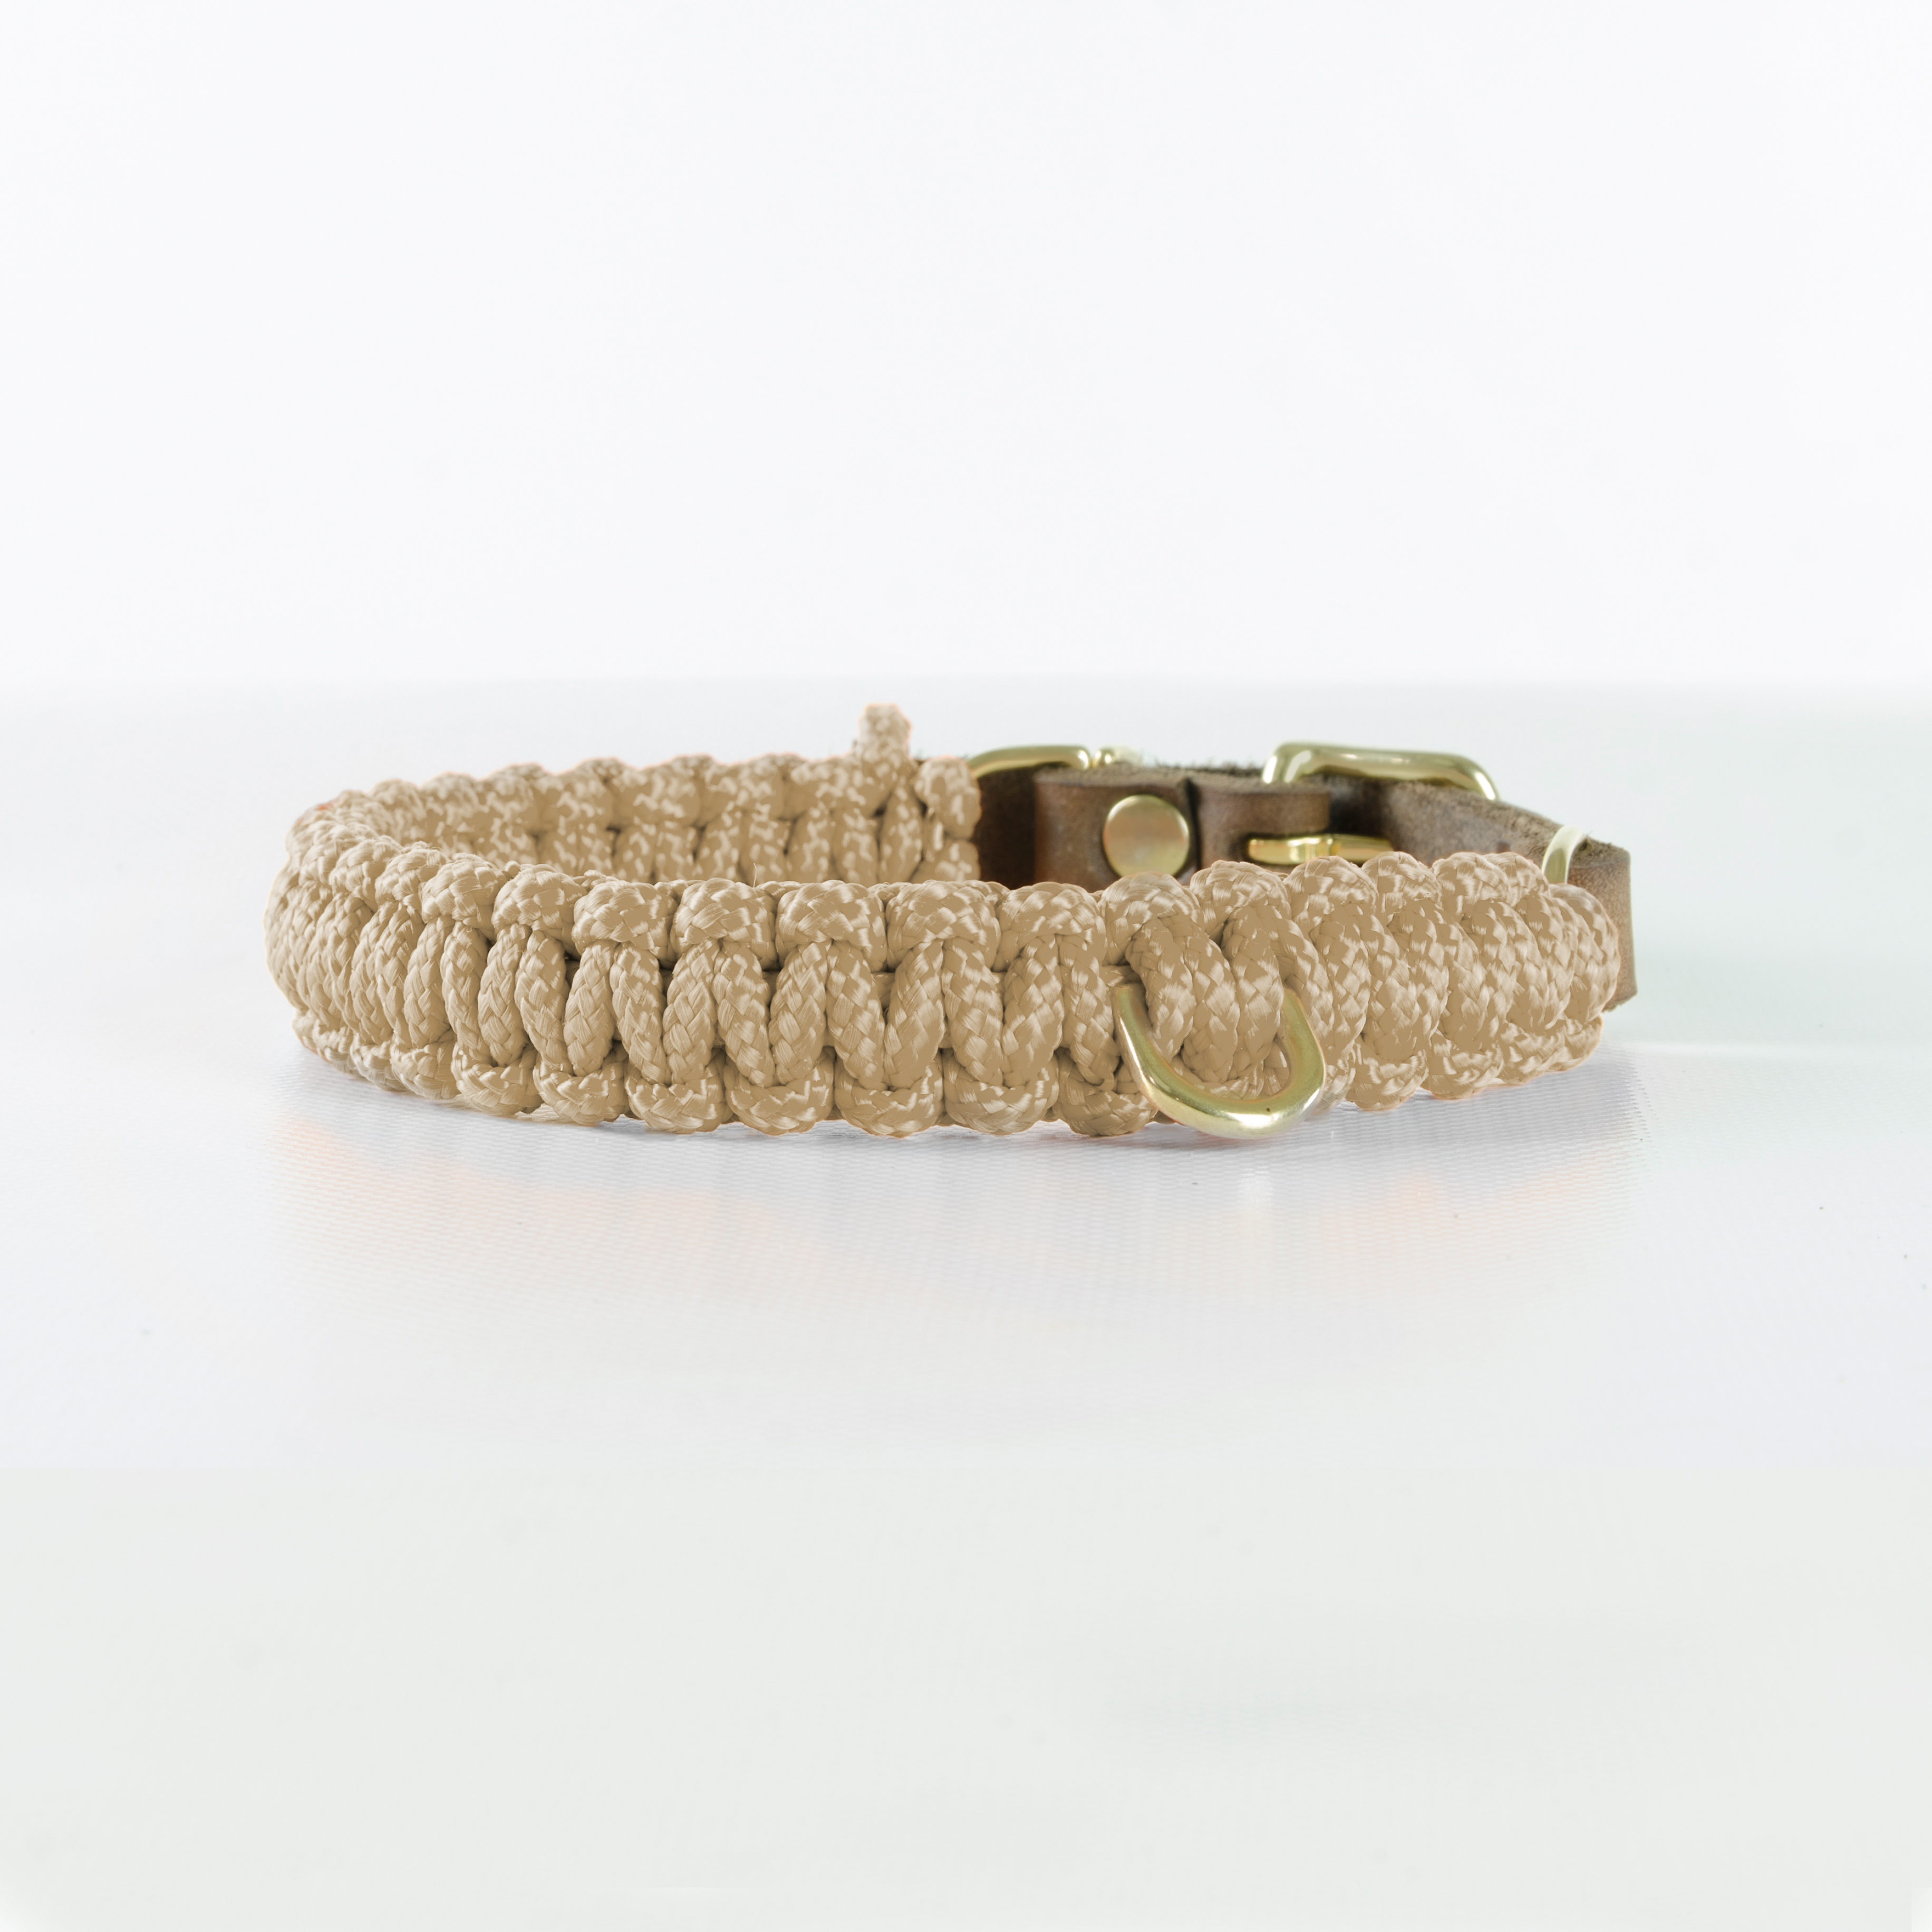 Hundehalsband Gold touch-of-leather-hundehalsband-beige (1)